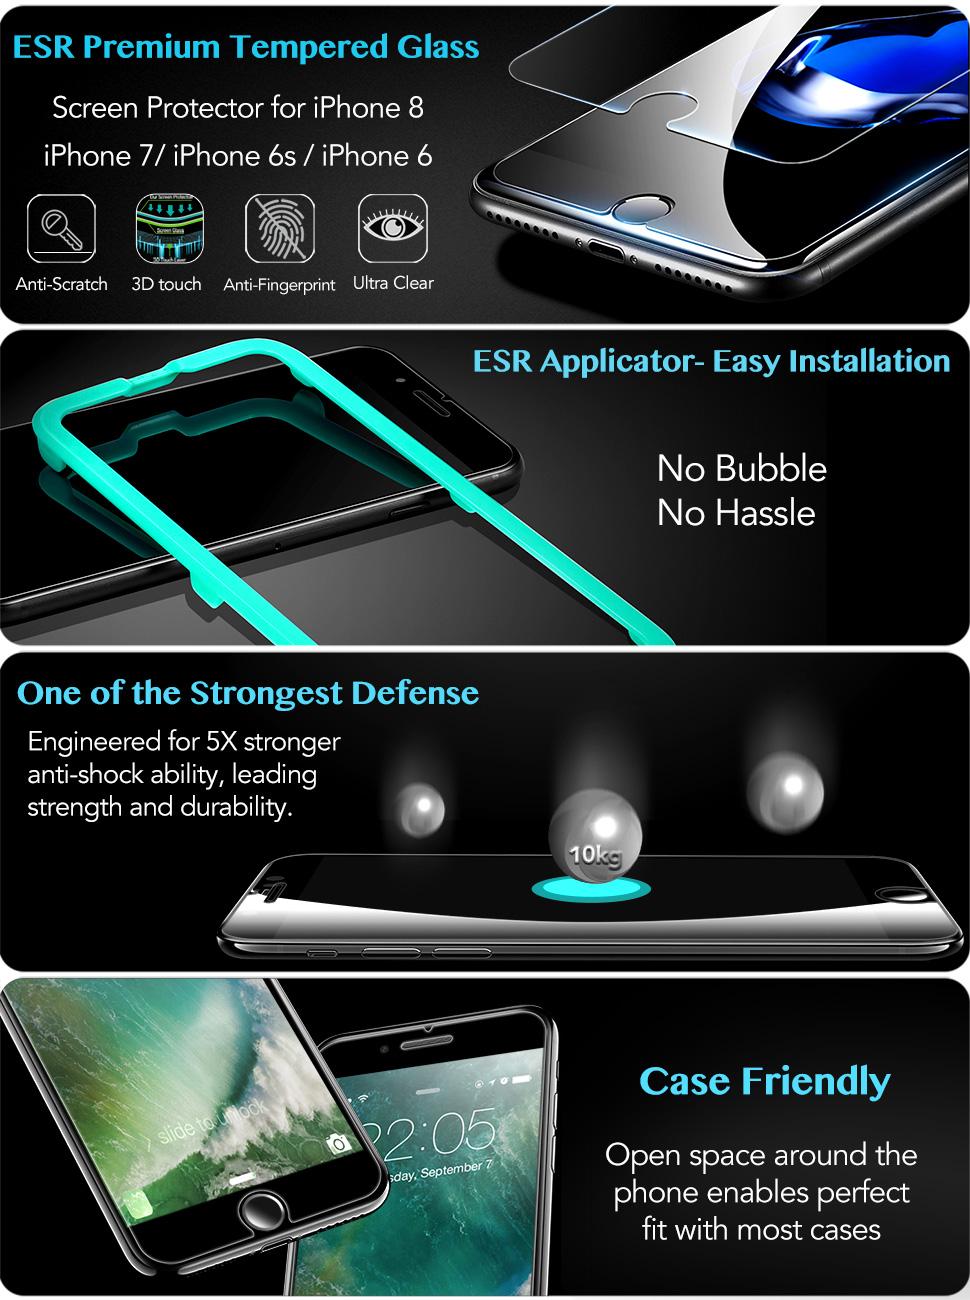 Folie sticla securizata ESR, Tempered Glass iPhone 8 / 7 / 6s / 6 Gohub